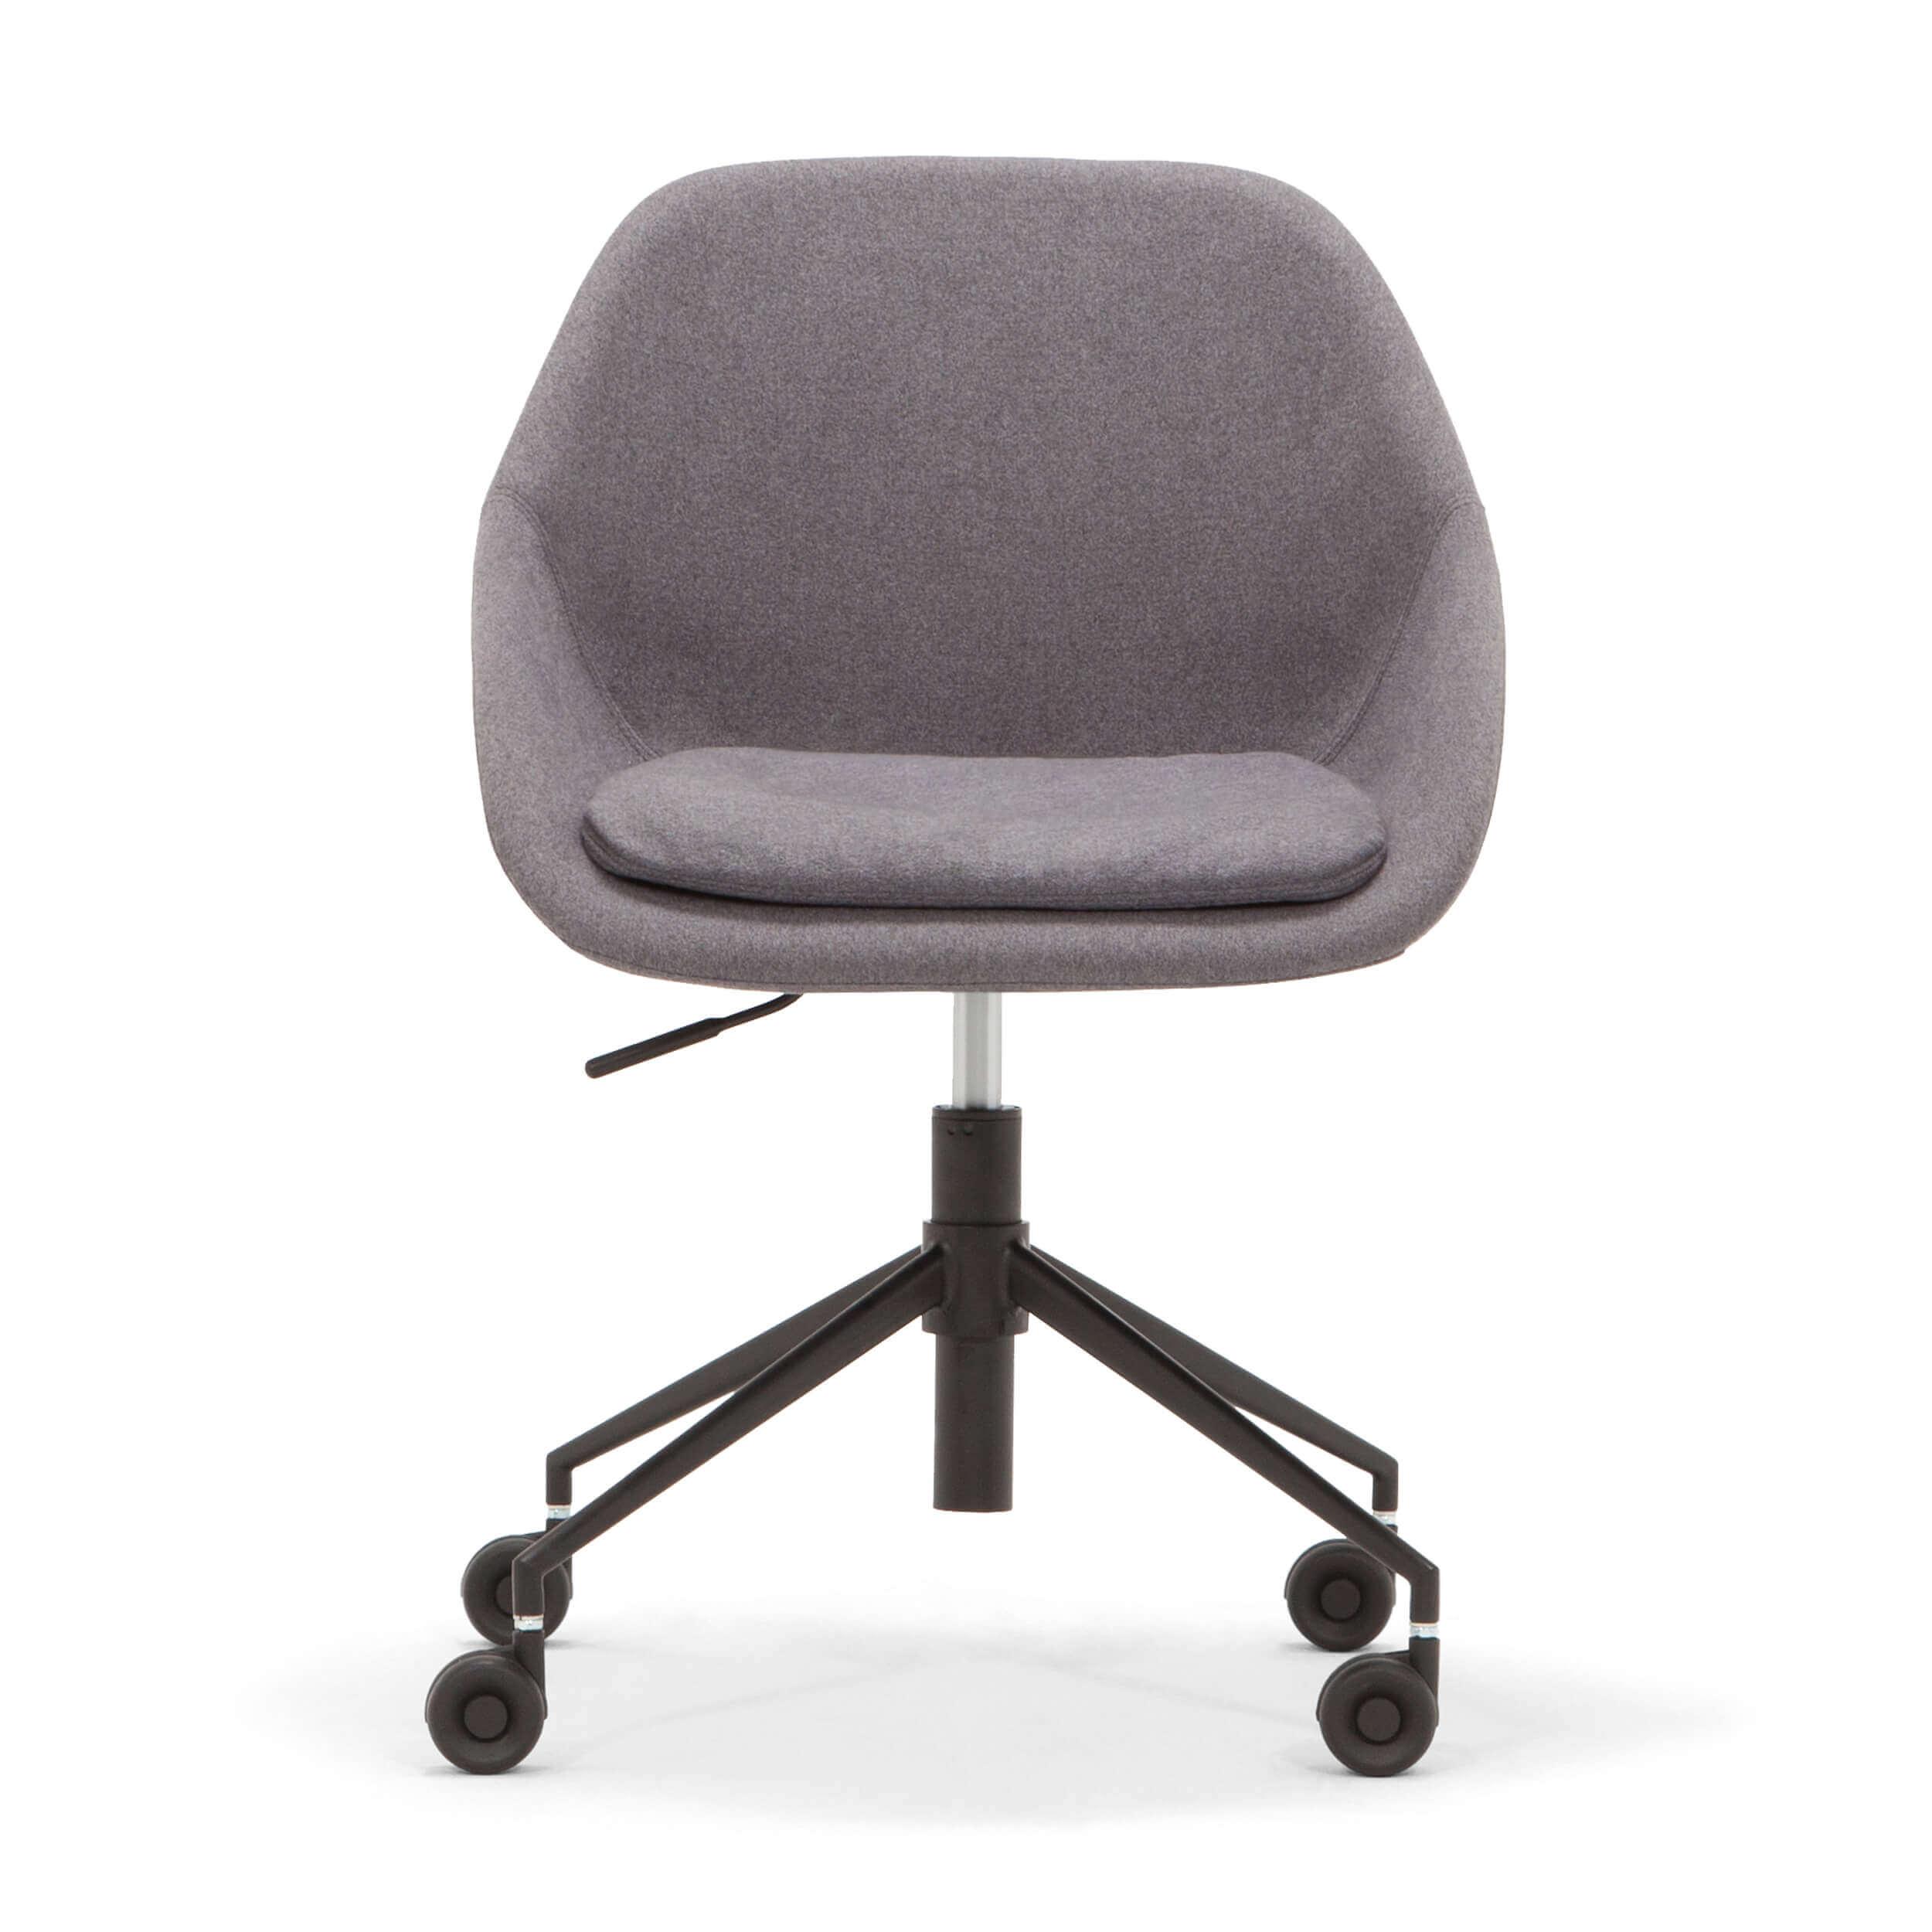 Eq3 S Iconic Nixon Office Chair